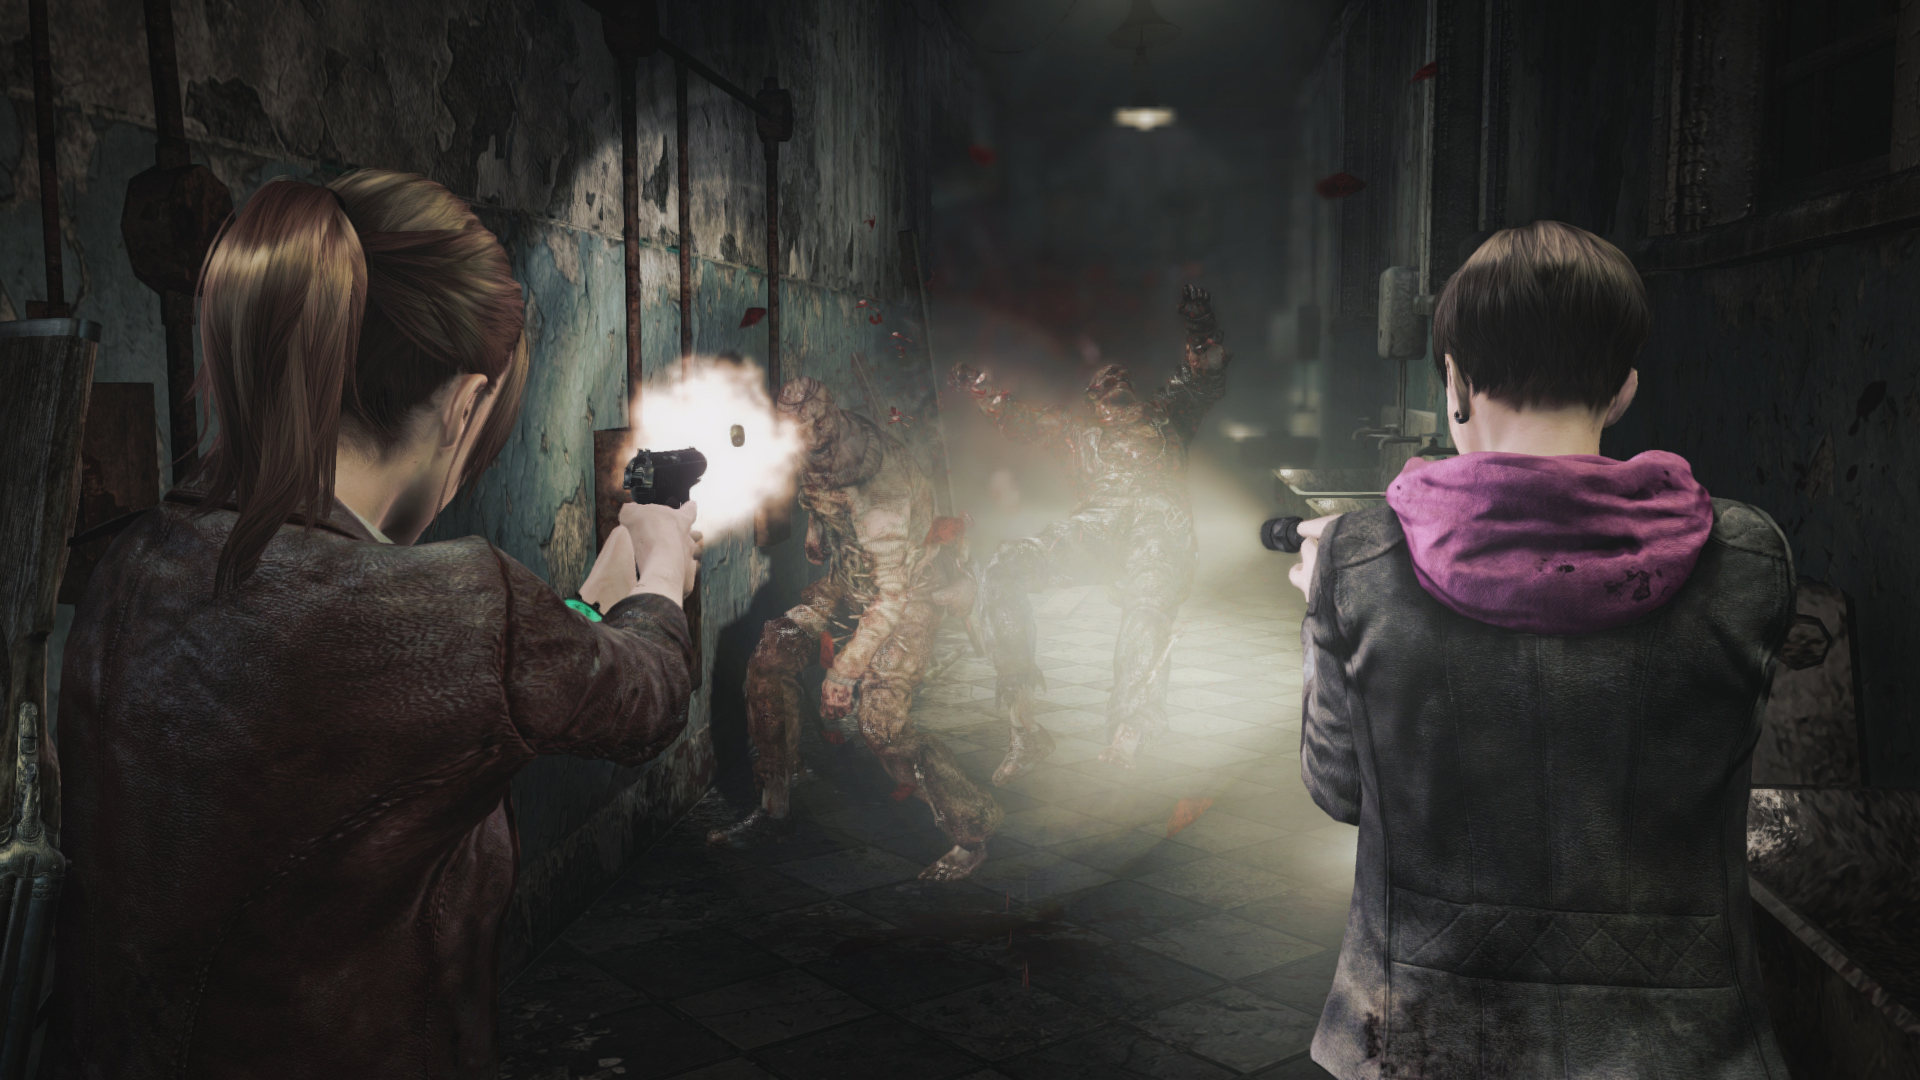 Resident Evil Revelations 2 ESPAÑOL PC Full + Update 2.1 (CODEX) + REPACK 3 DVD5 (JPW) 4